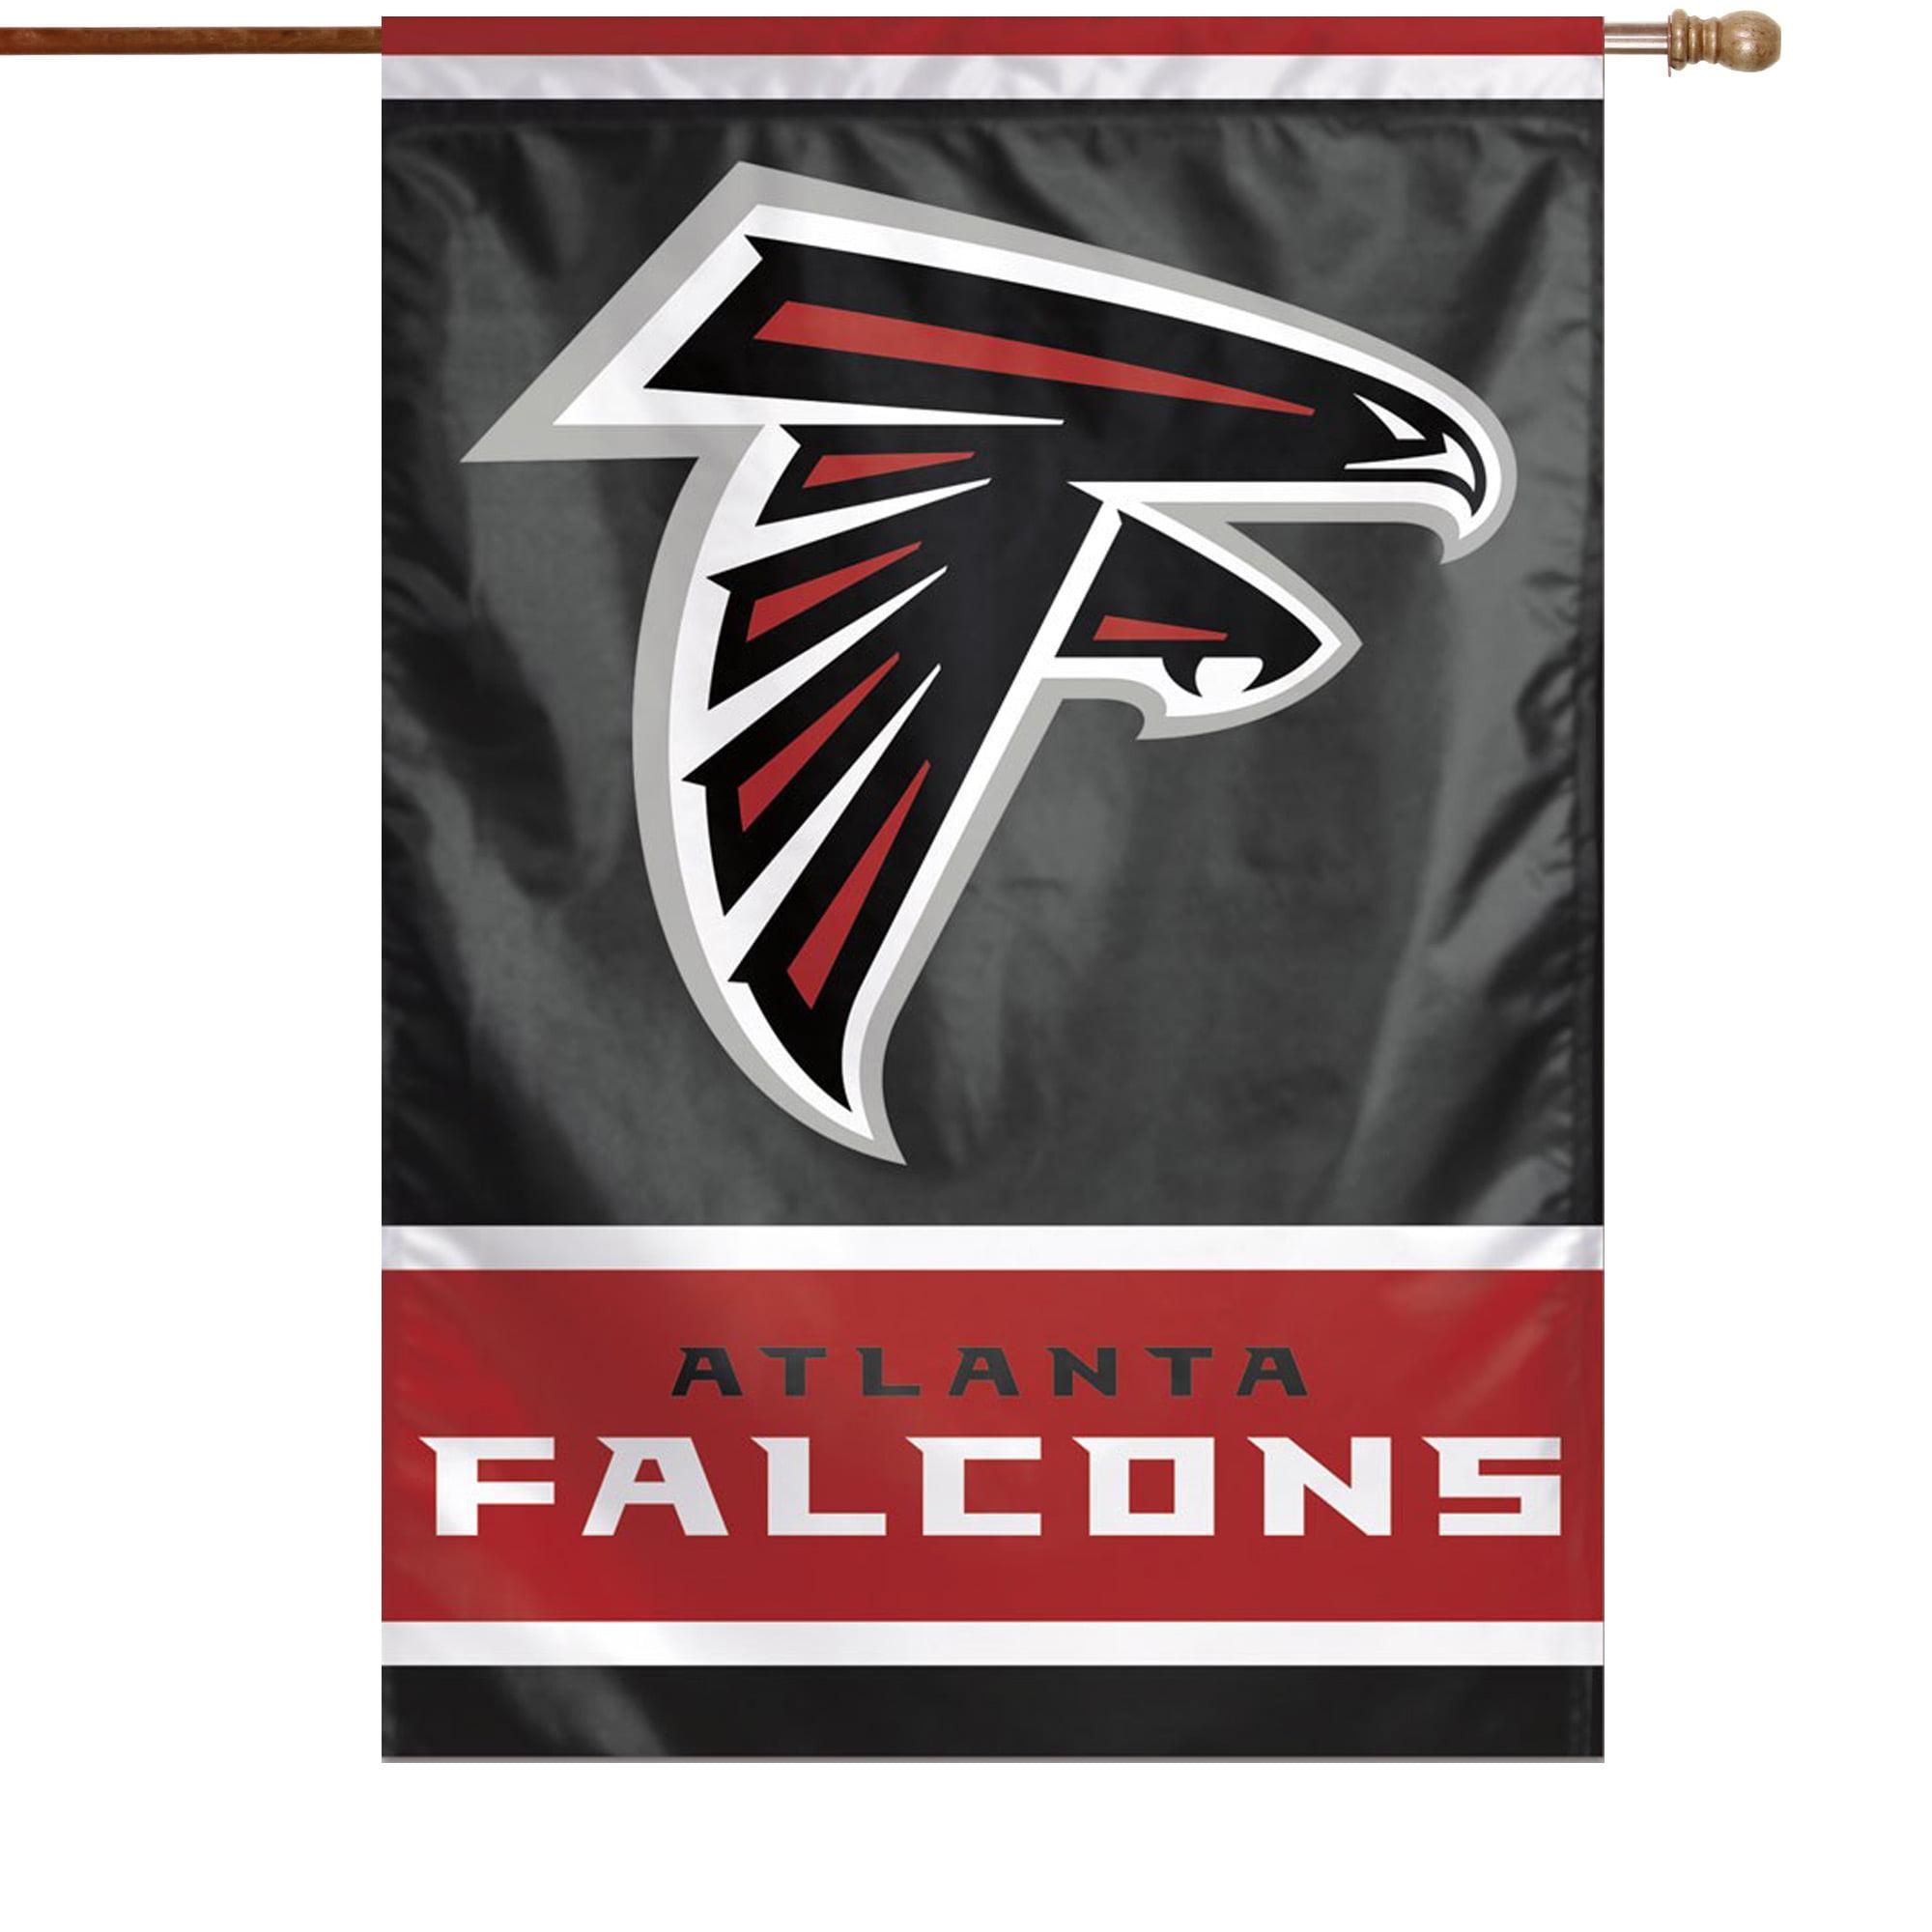 "Atlanta Falcons WinCraft 28"" x 40"" Primary Logo House Flag - No Size"